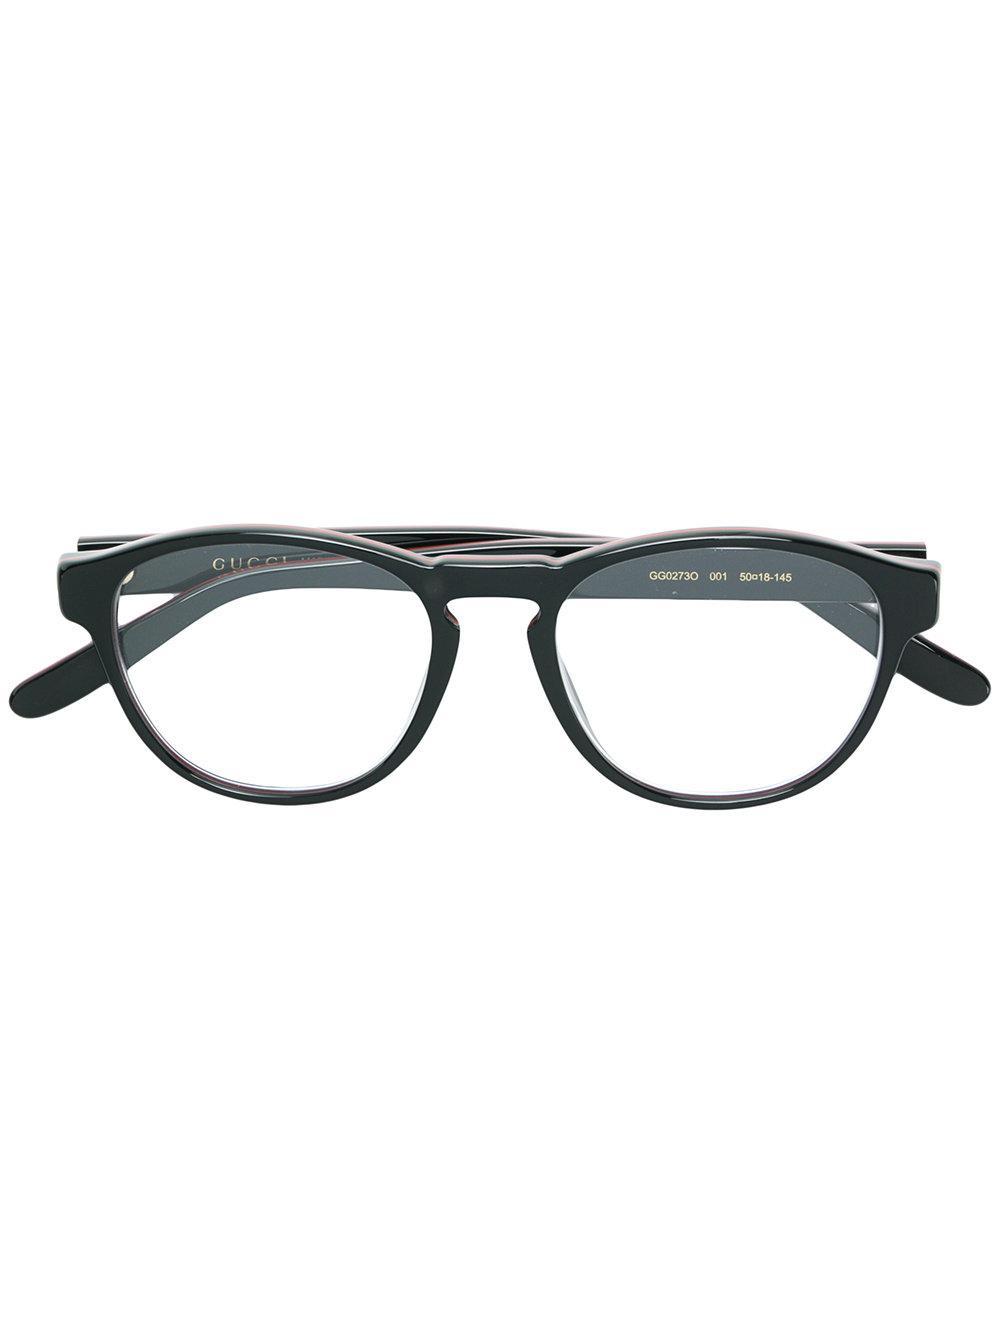 Gucci Eyewear Round Glasses - Black